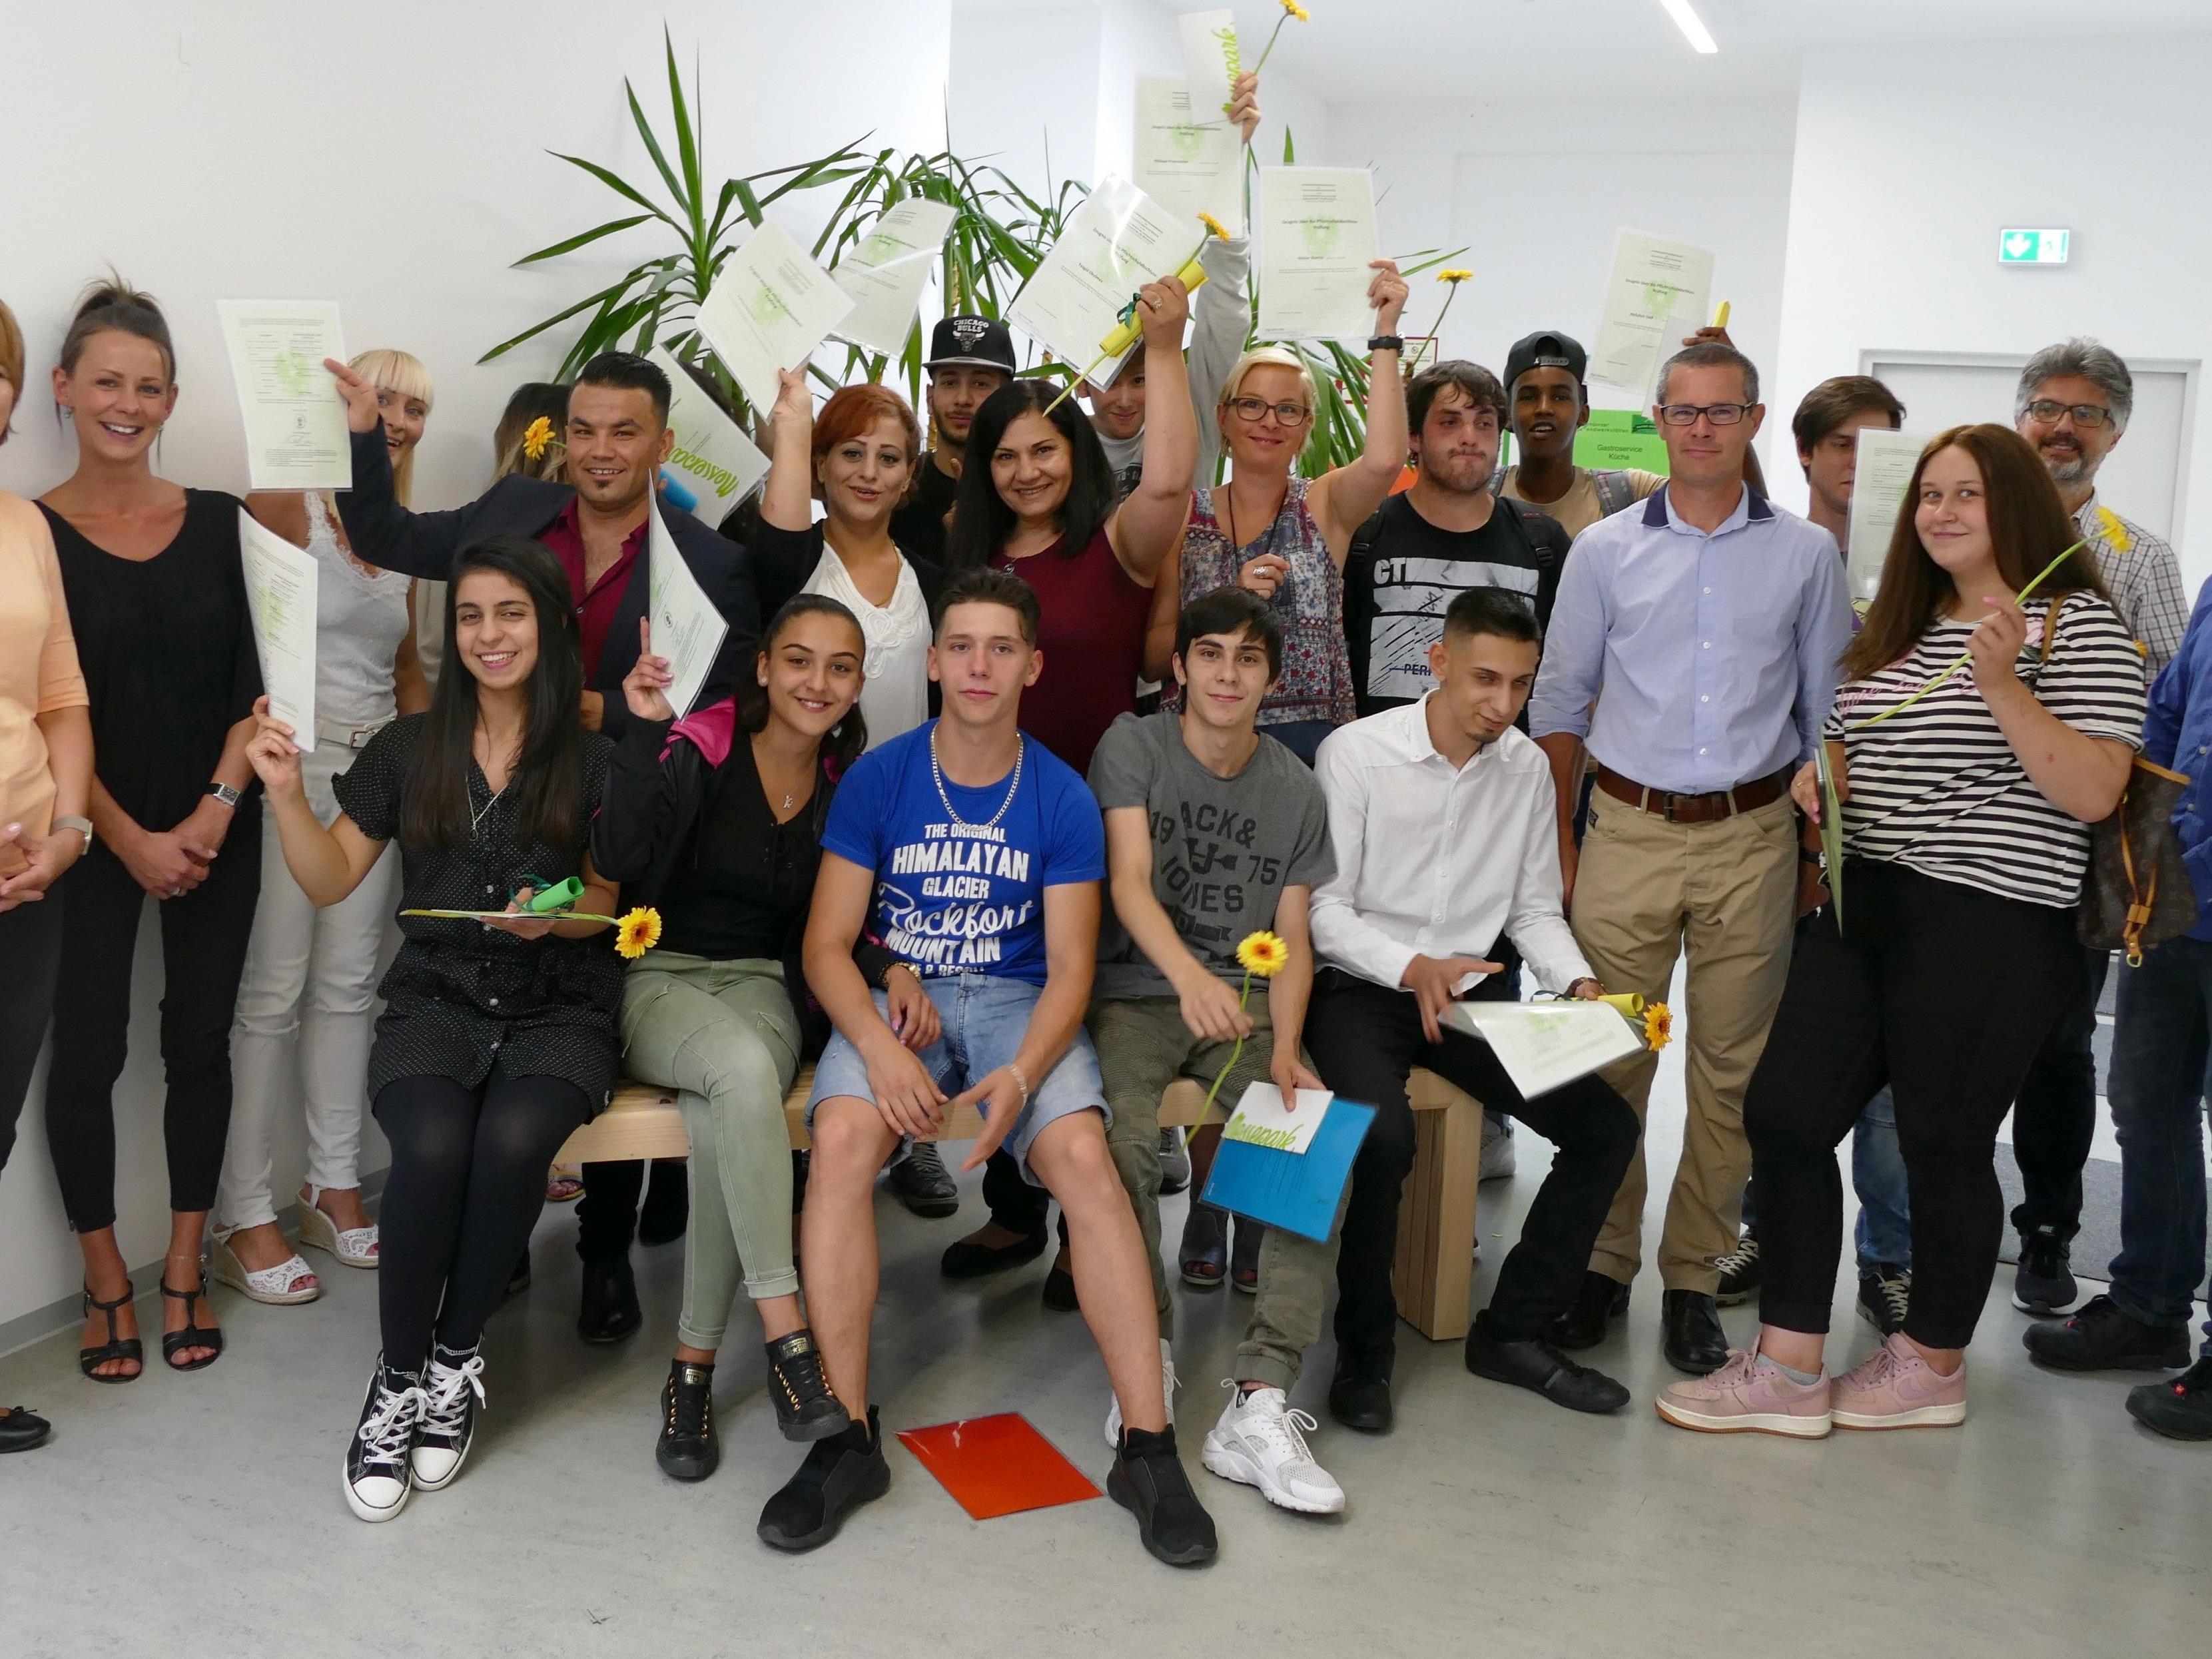 Leuchtturm Jugendwerkstätten: Große Freude über 20 positive ...